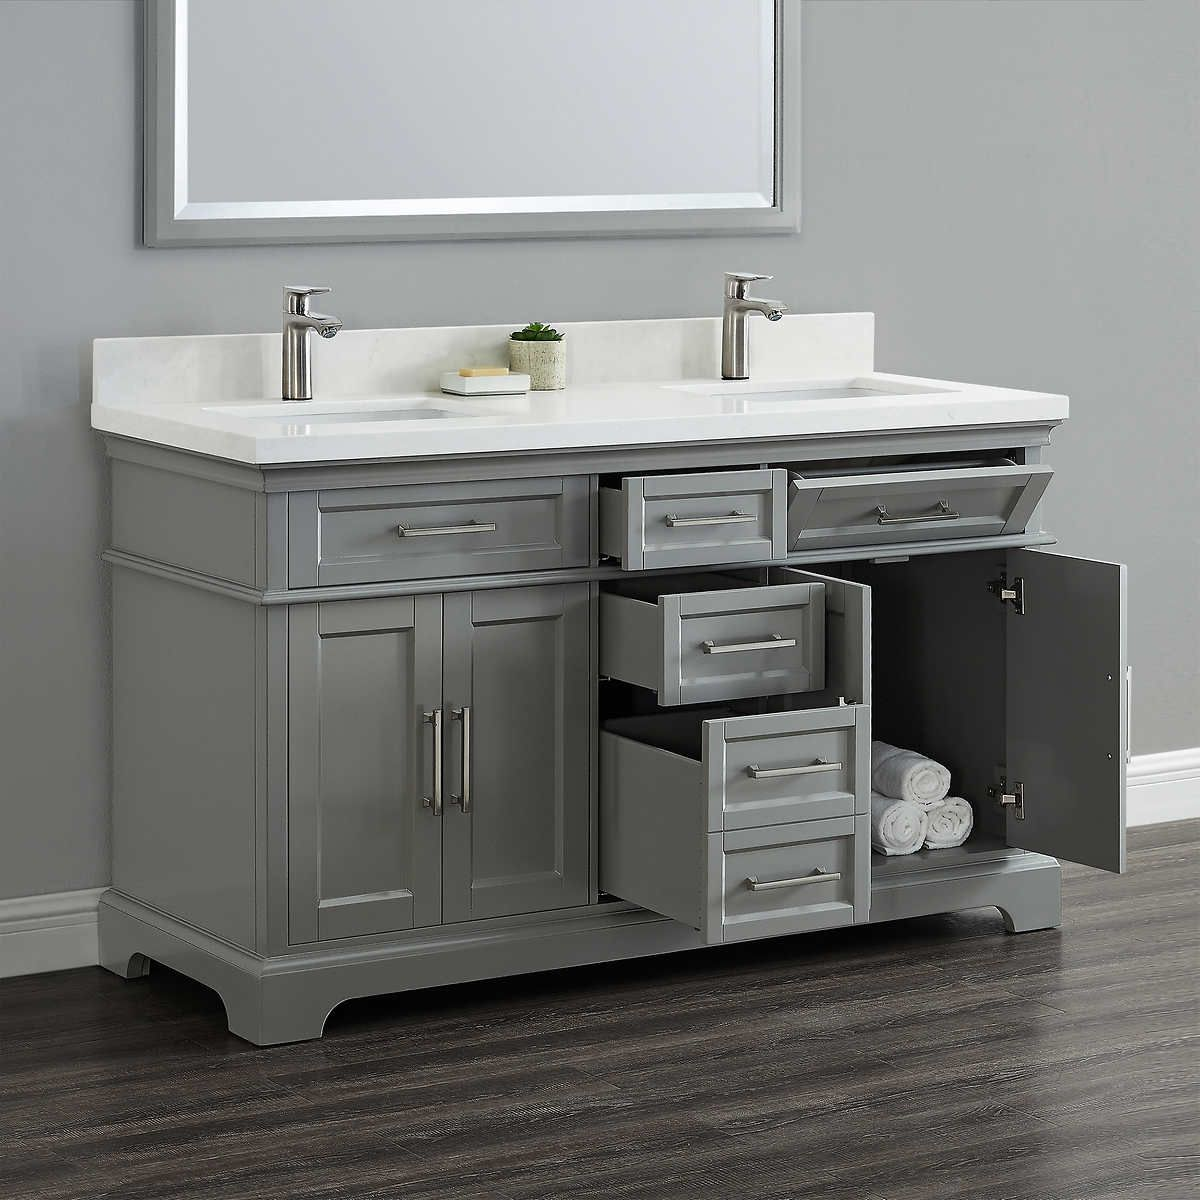 899 Costco Double Sink Vanity Vanity Sink Vanity